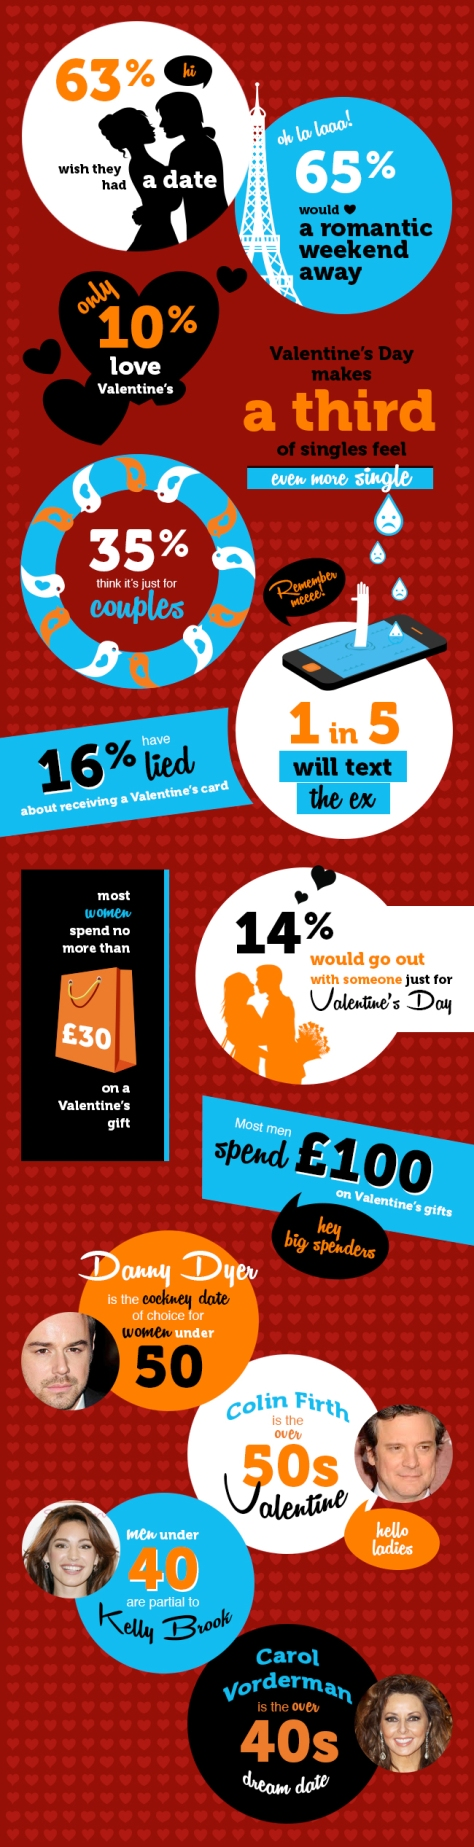 Smooch Valentine's Survey Infographic